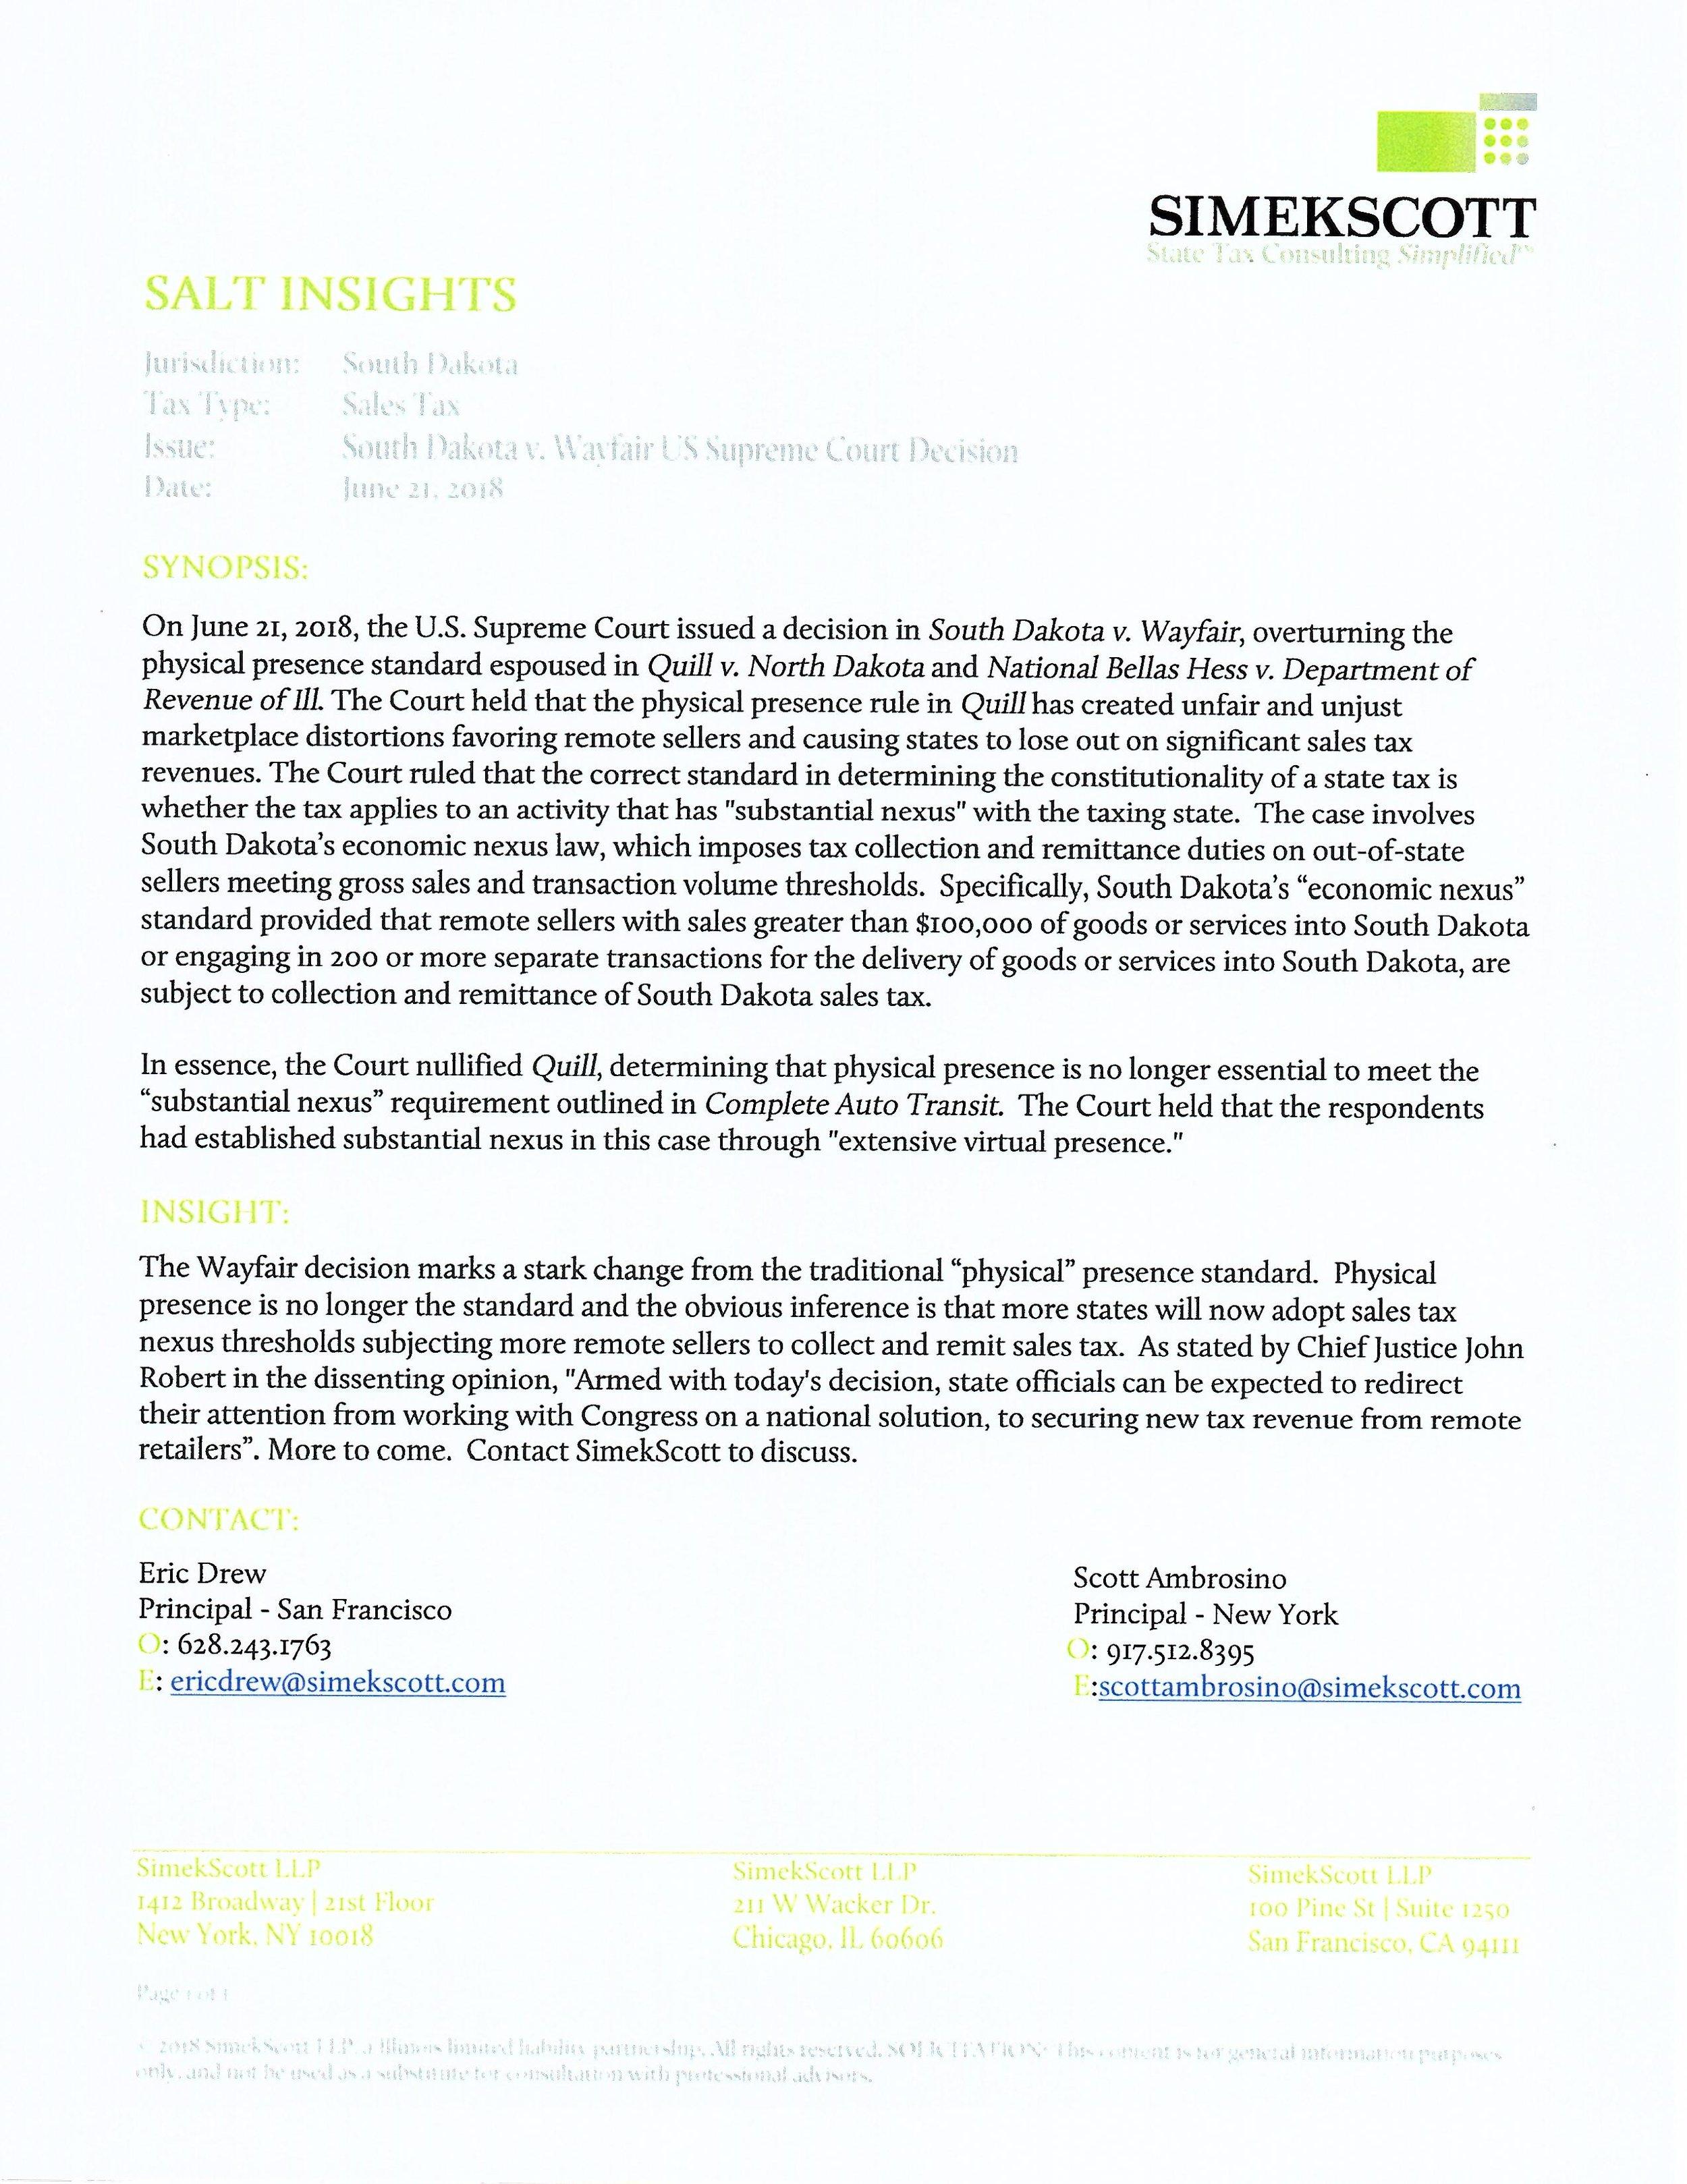 South_Dakota_v_Wayfair_Summary_Of_Decision.jpg